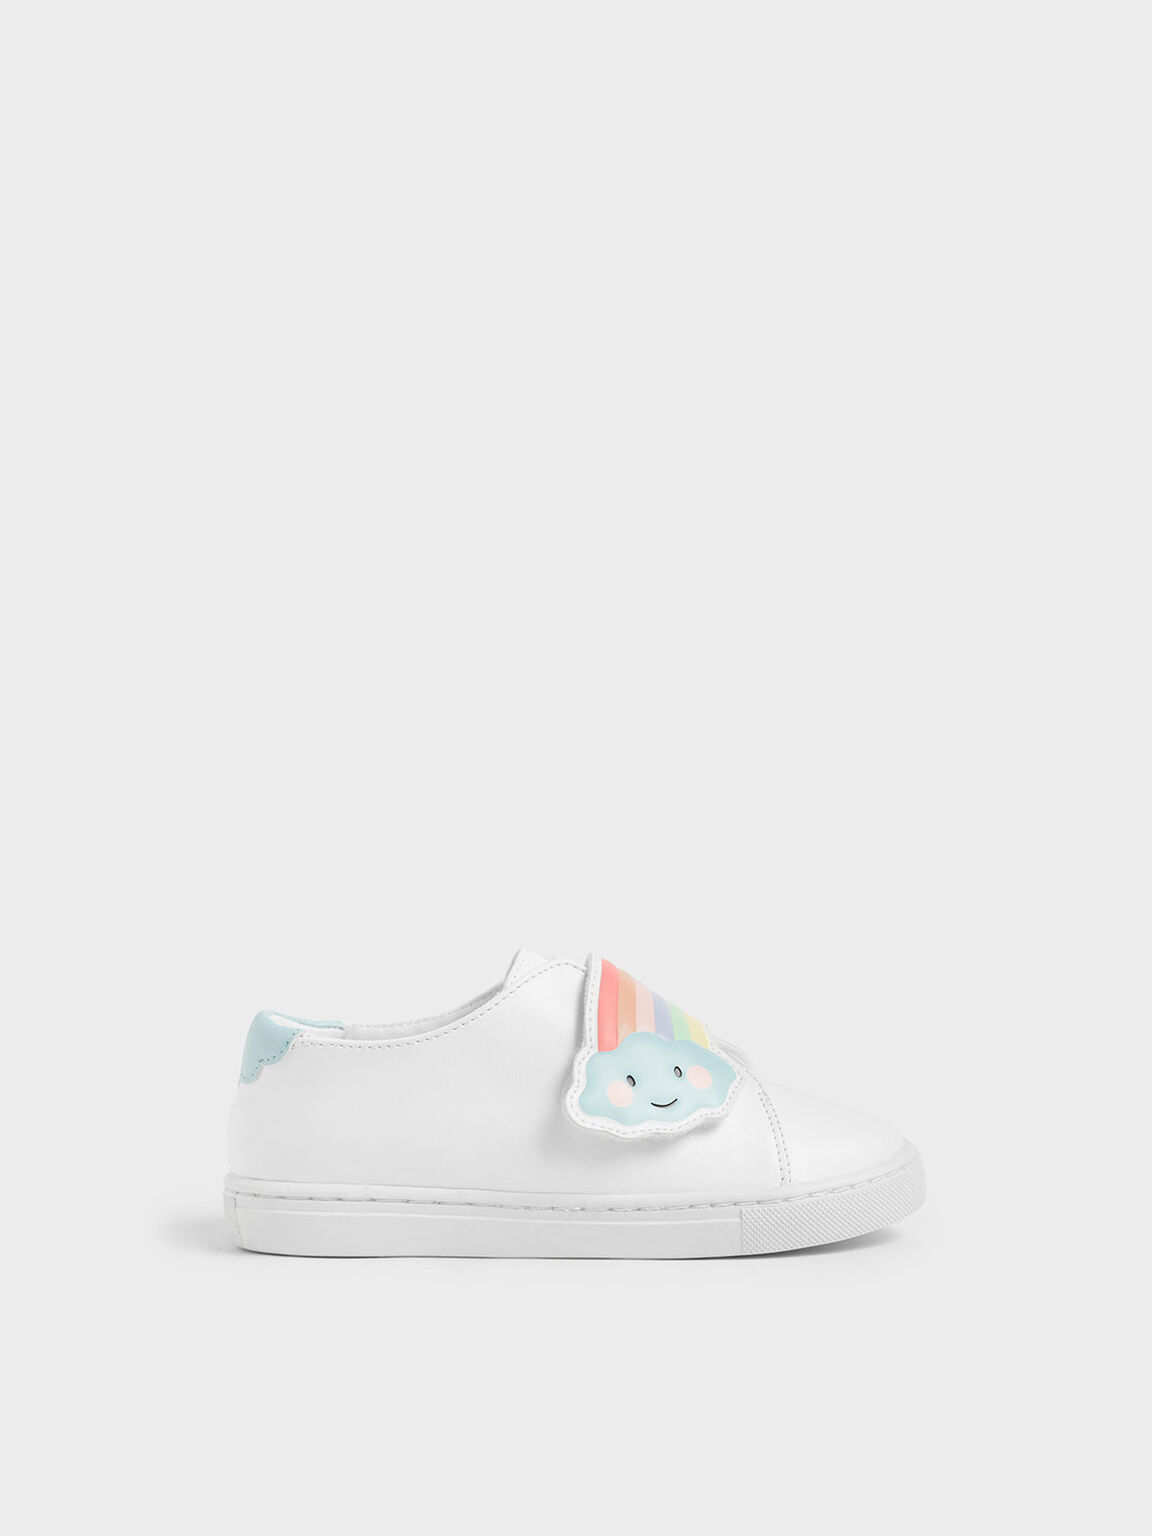 Girls' Rainbow Slip-On Sneakers, White, hi-res